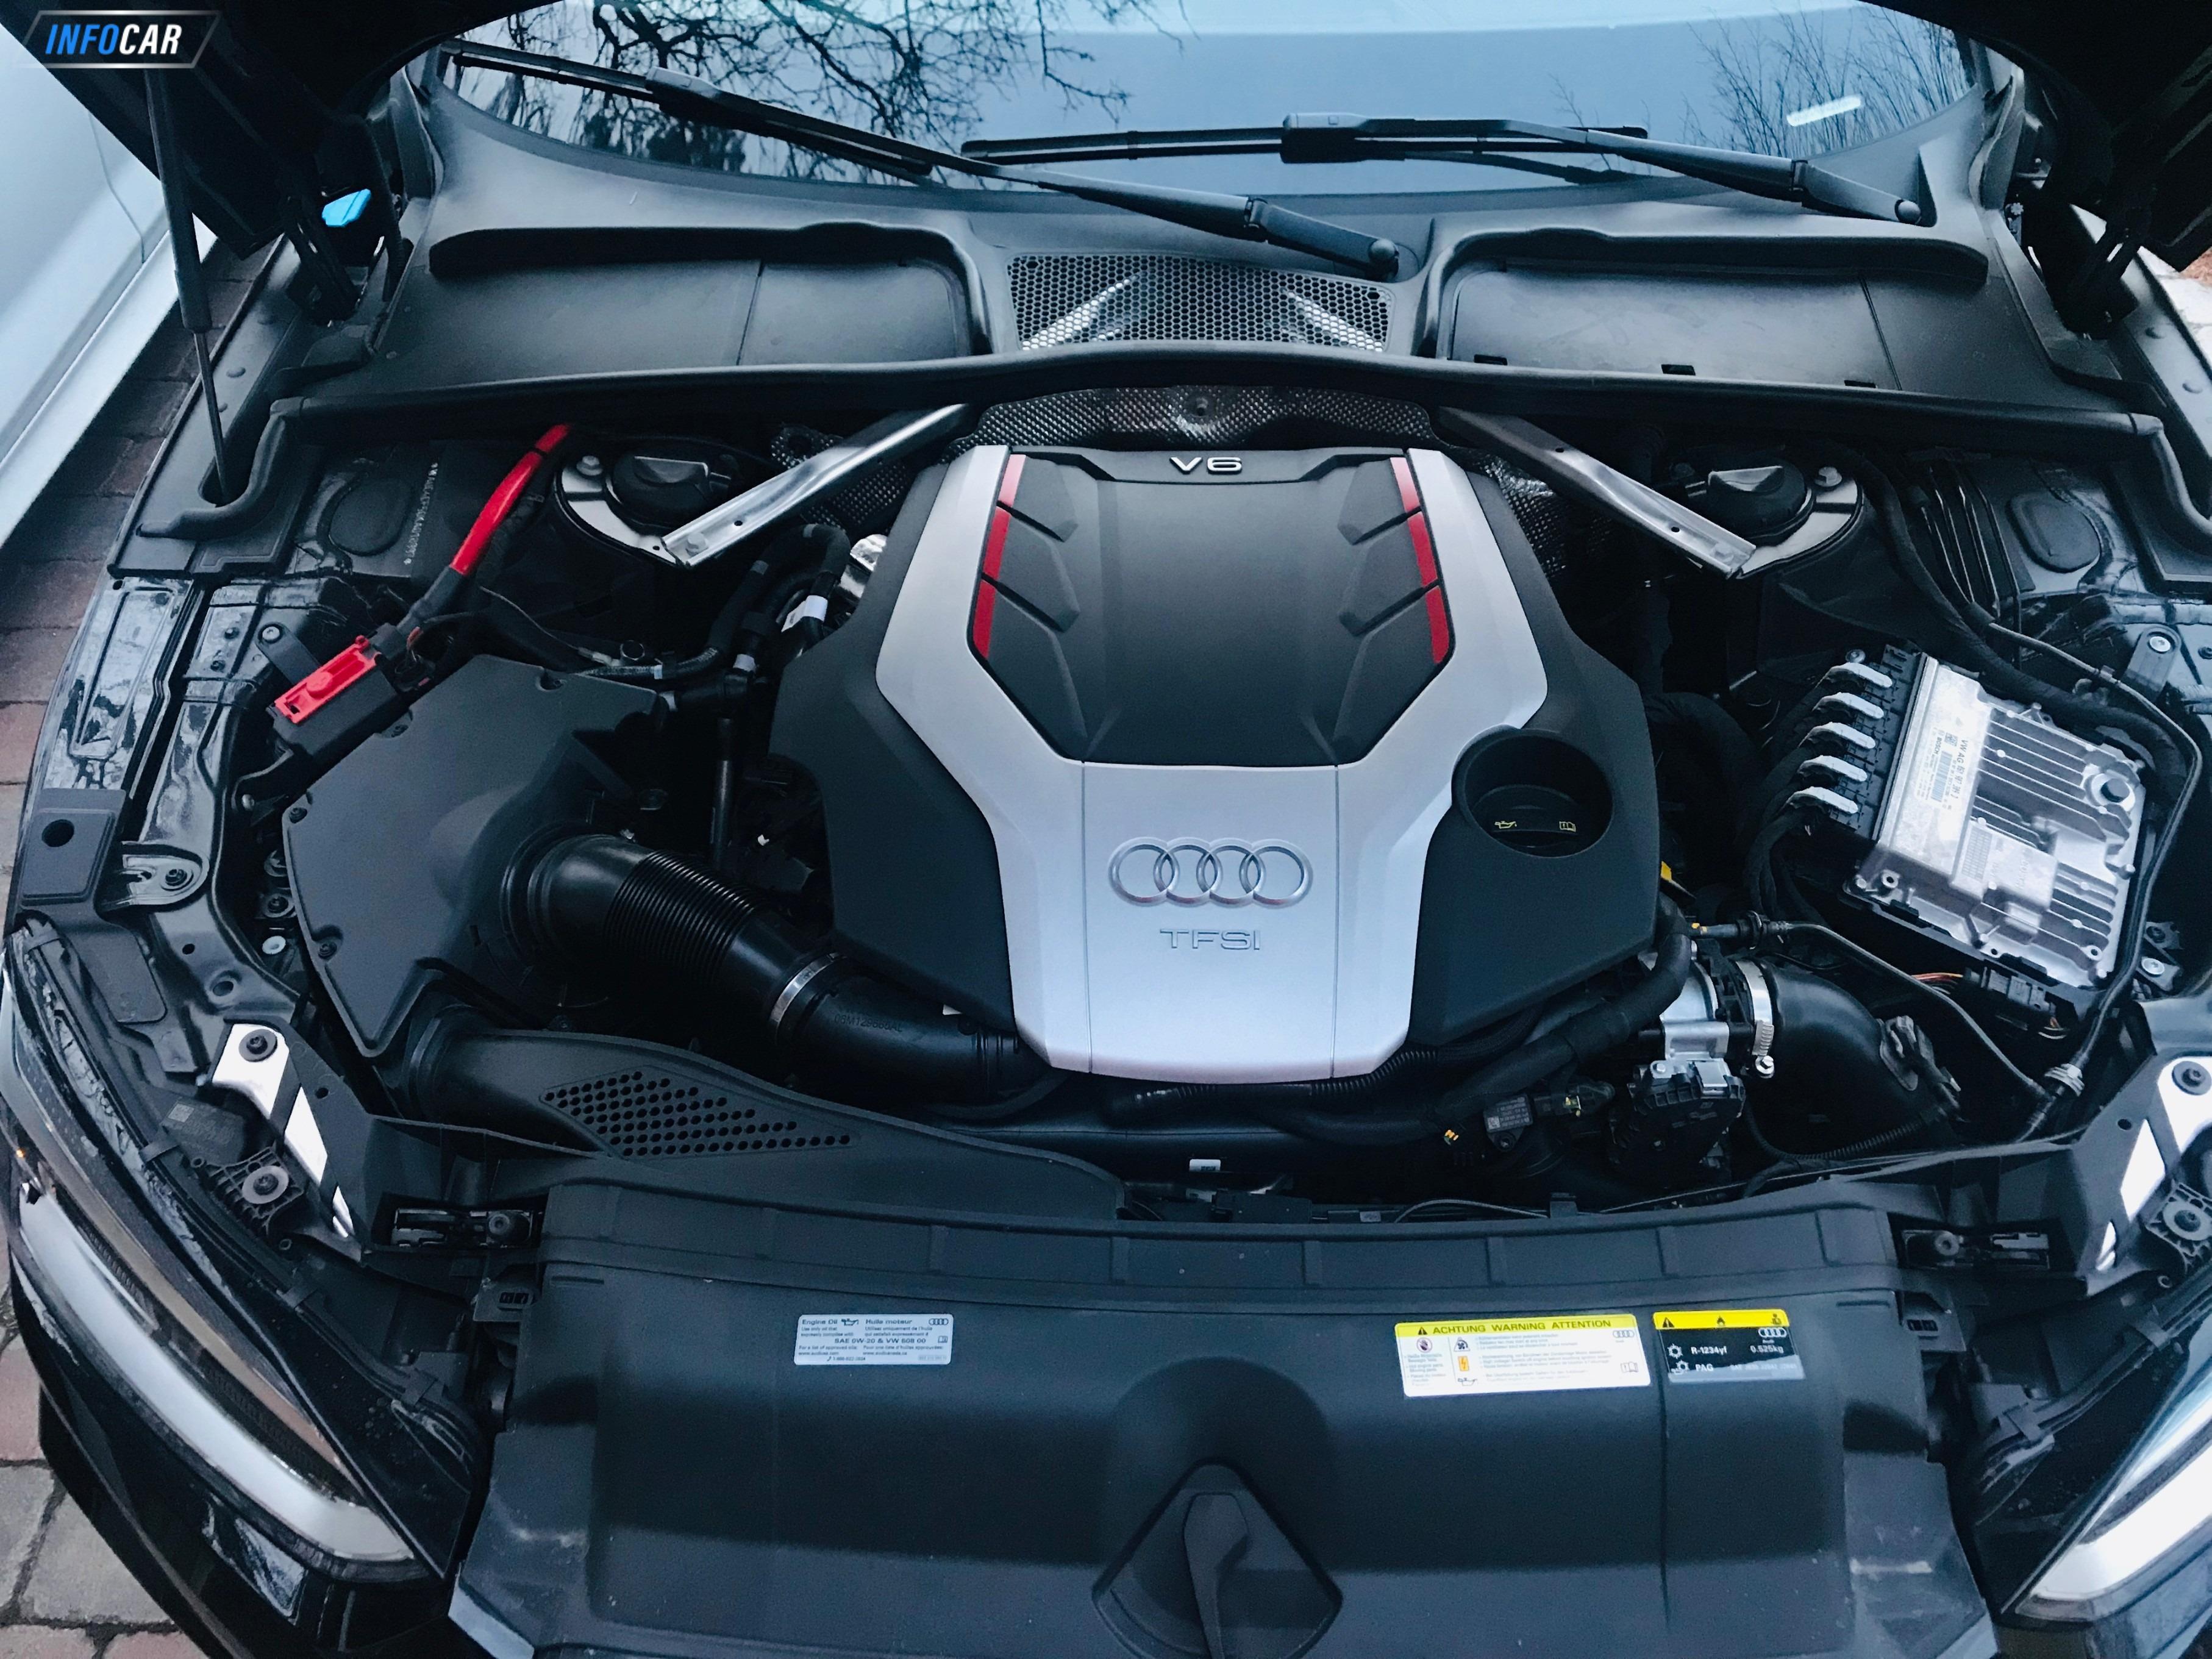 2019 Audi S5 Sportback - INFOCAR - Toronto's Most Comprehensive New and Used Auto Trading Platform